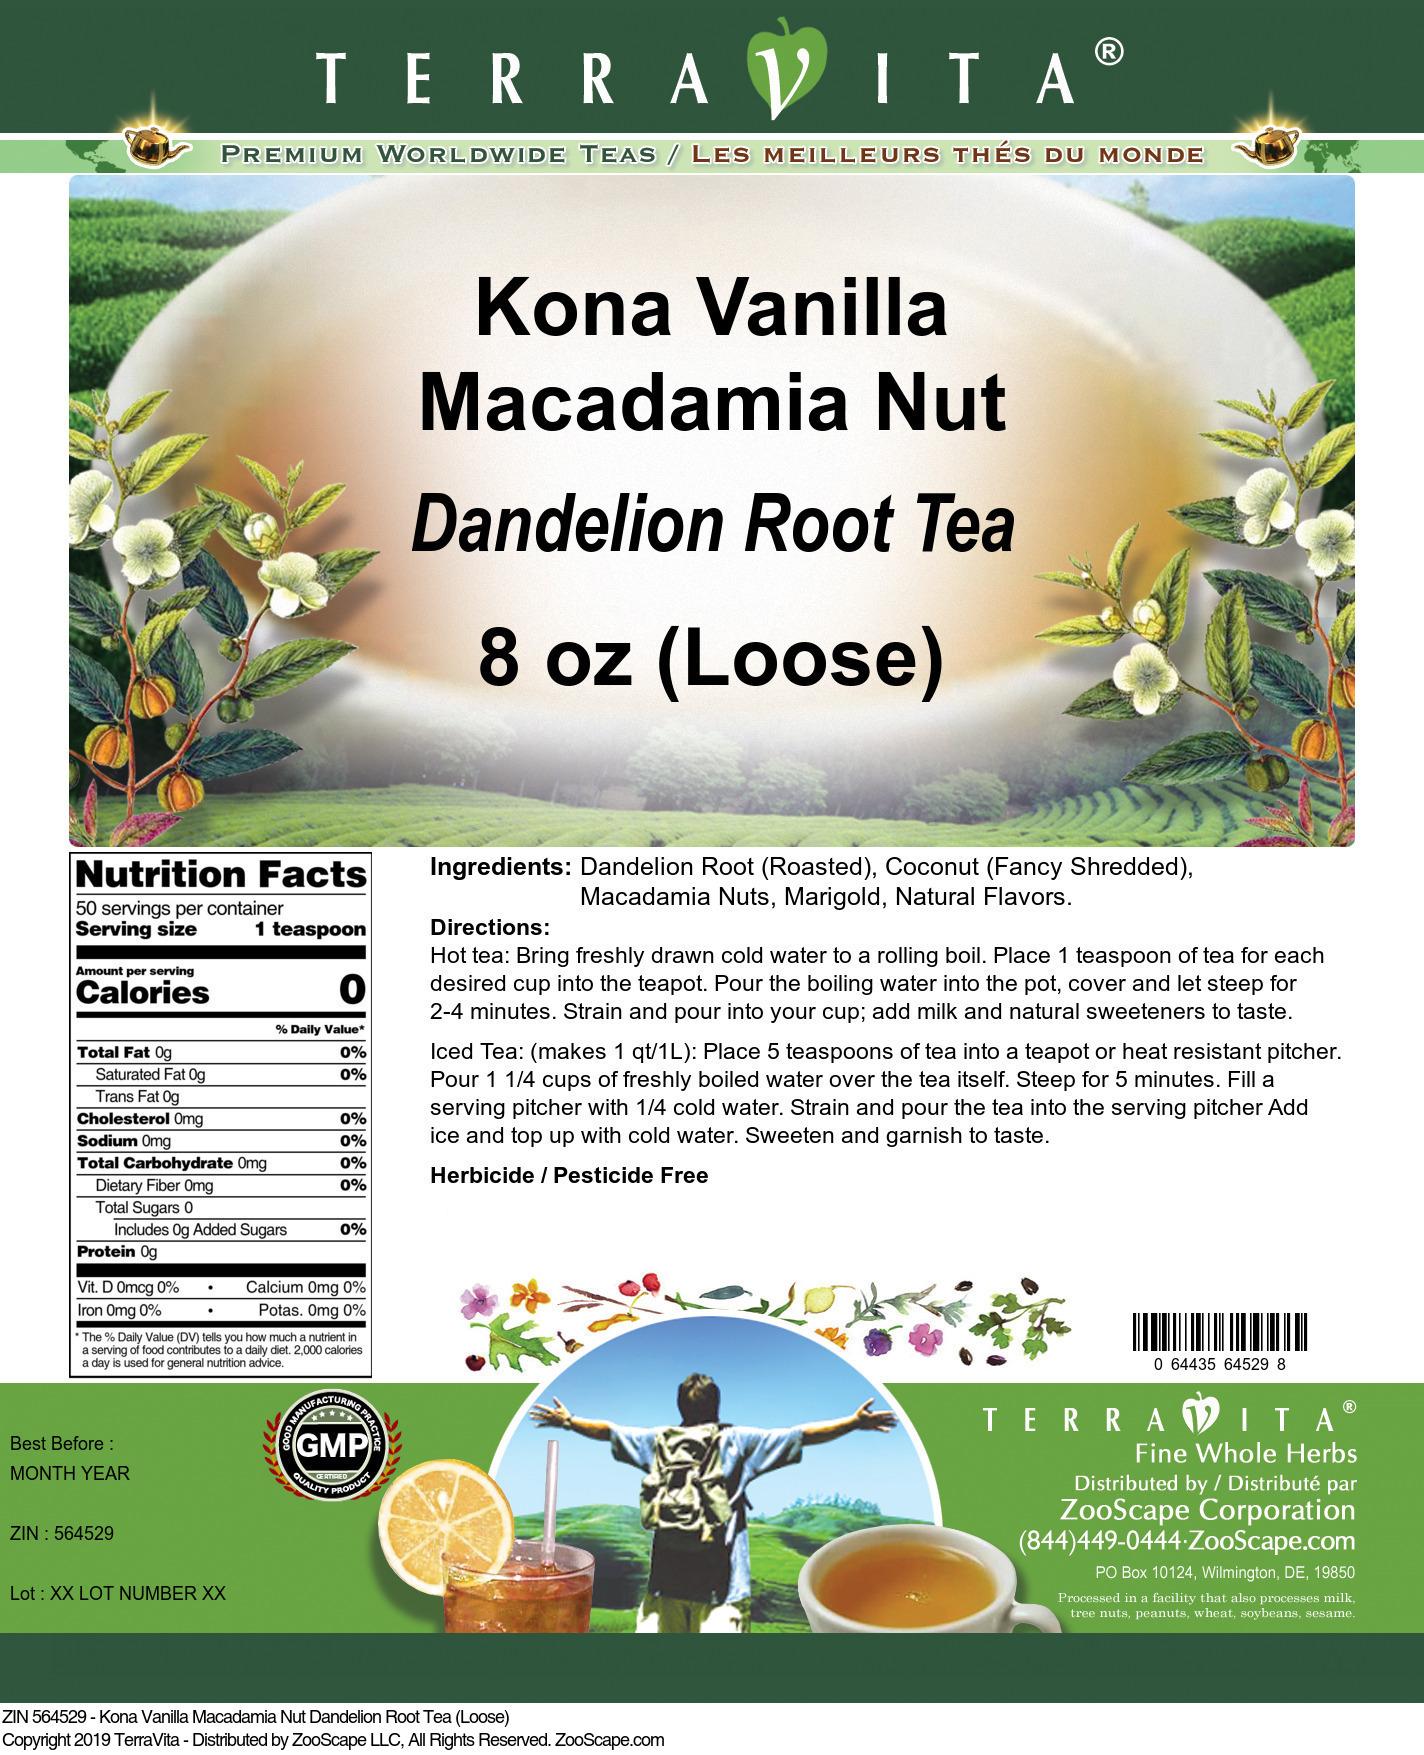 Kona Vanilla Macadamia Nut Dandelion Root Tea (Loose)